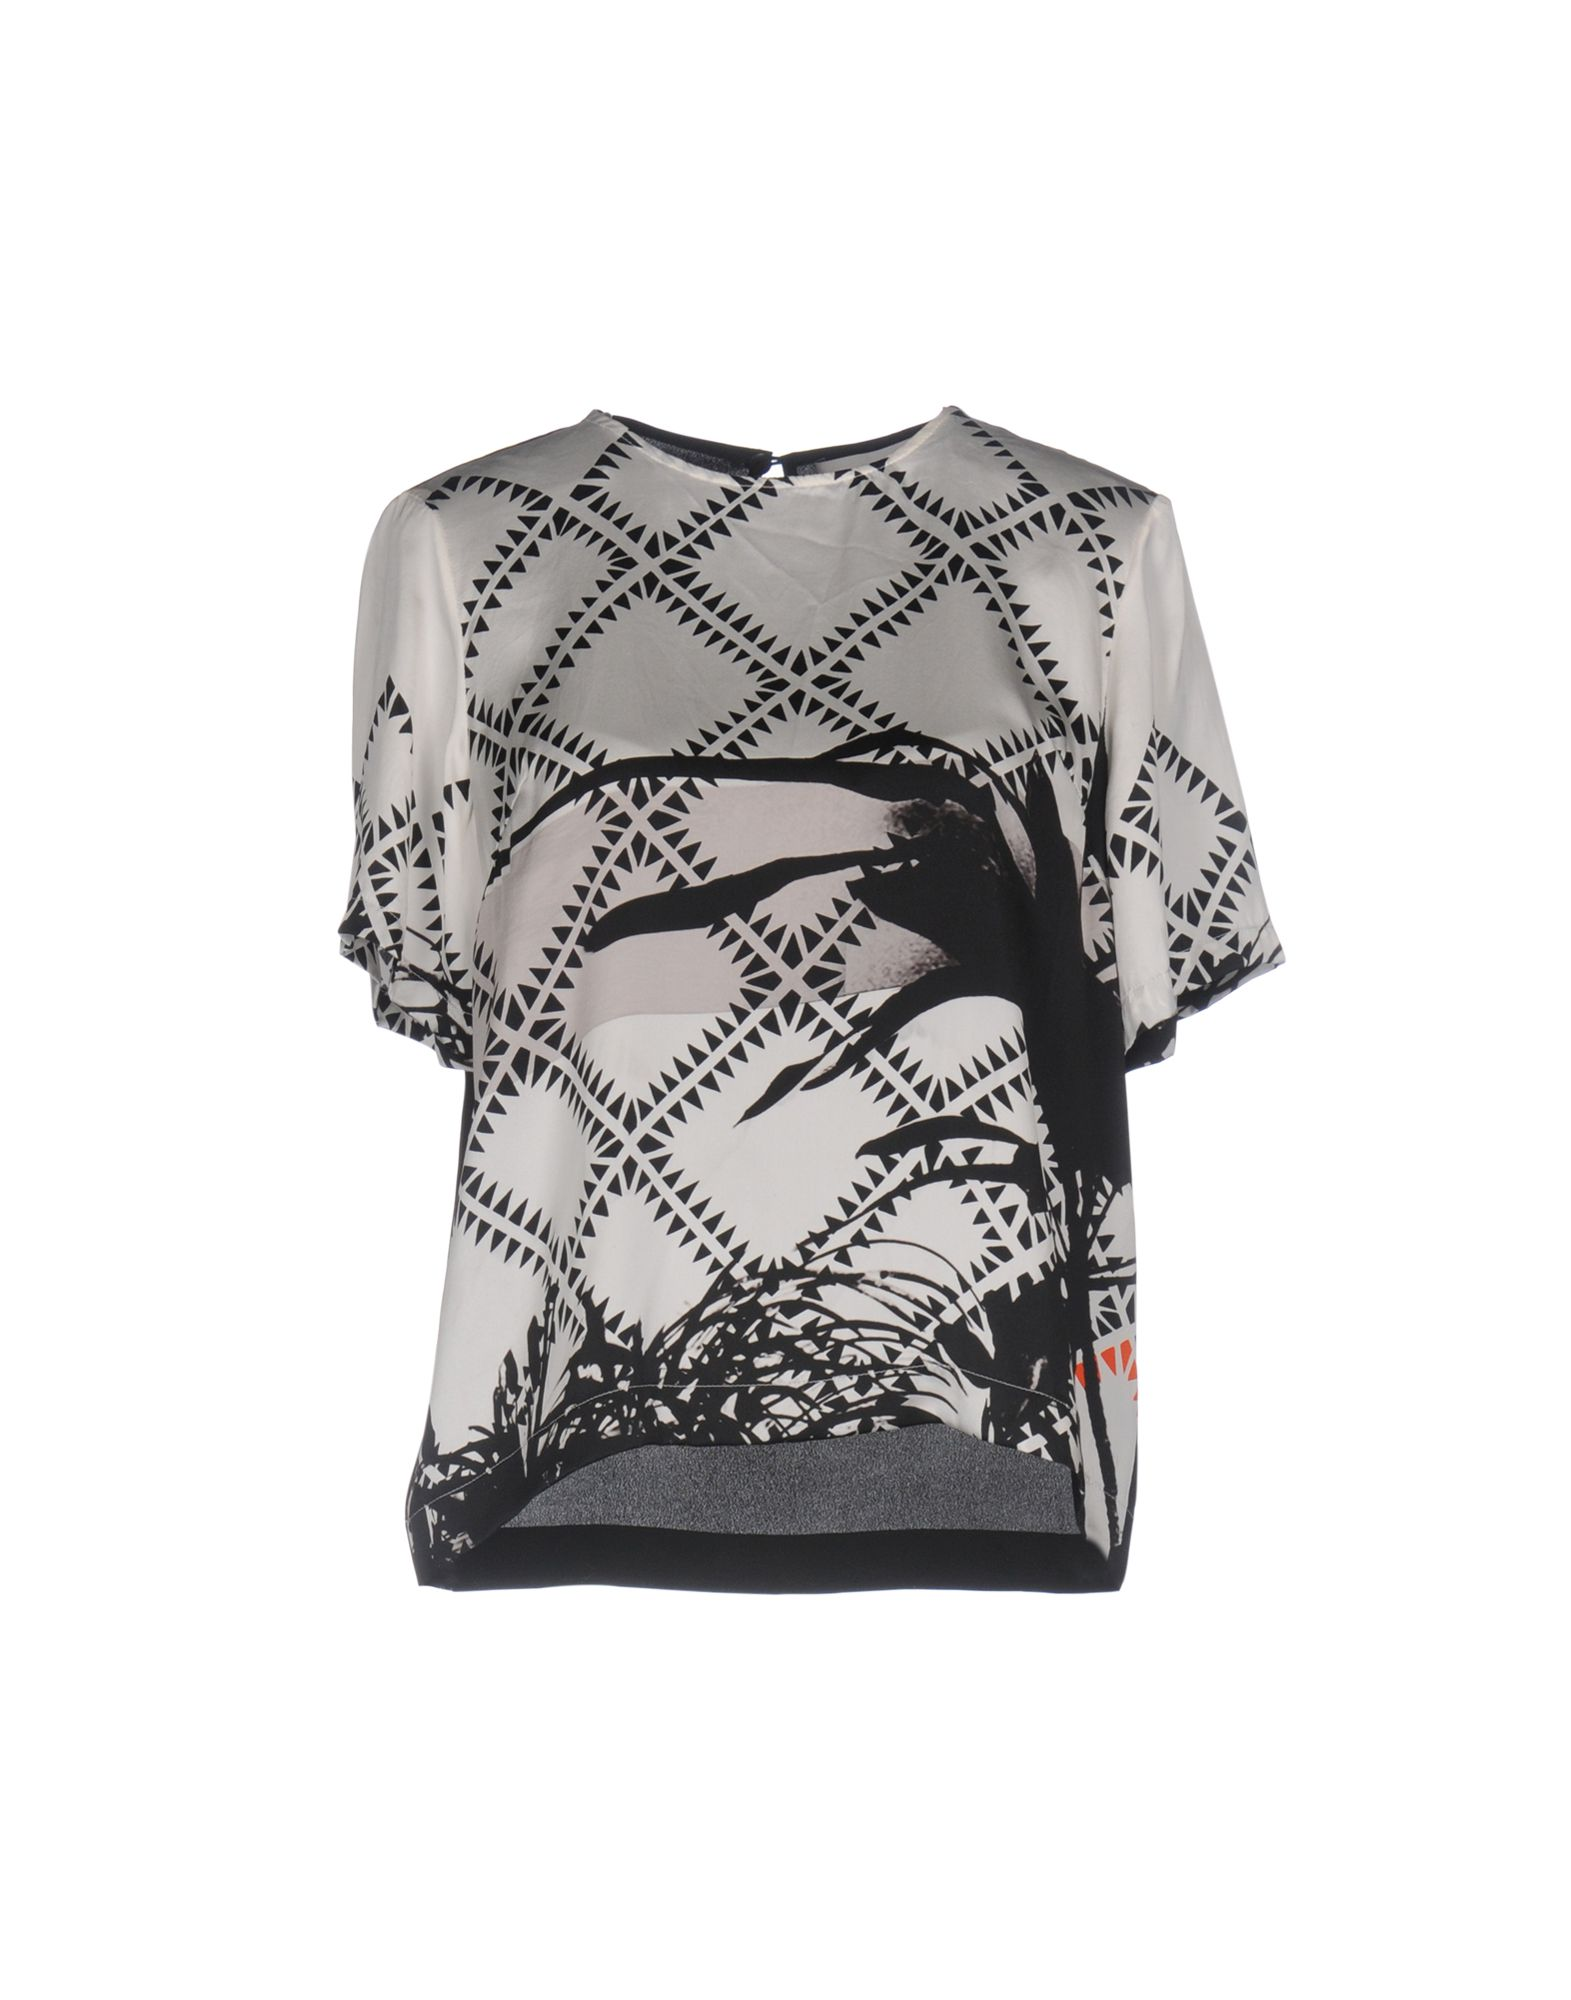 PREEN by THORNTON BREGAZZI Damen Bluse Farbe Weiß Größe 3